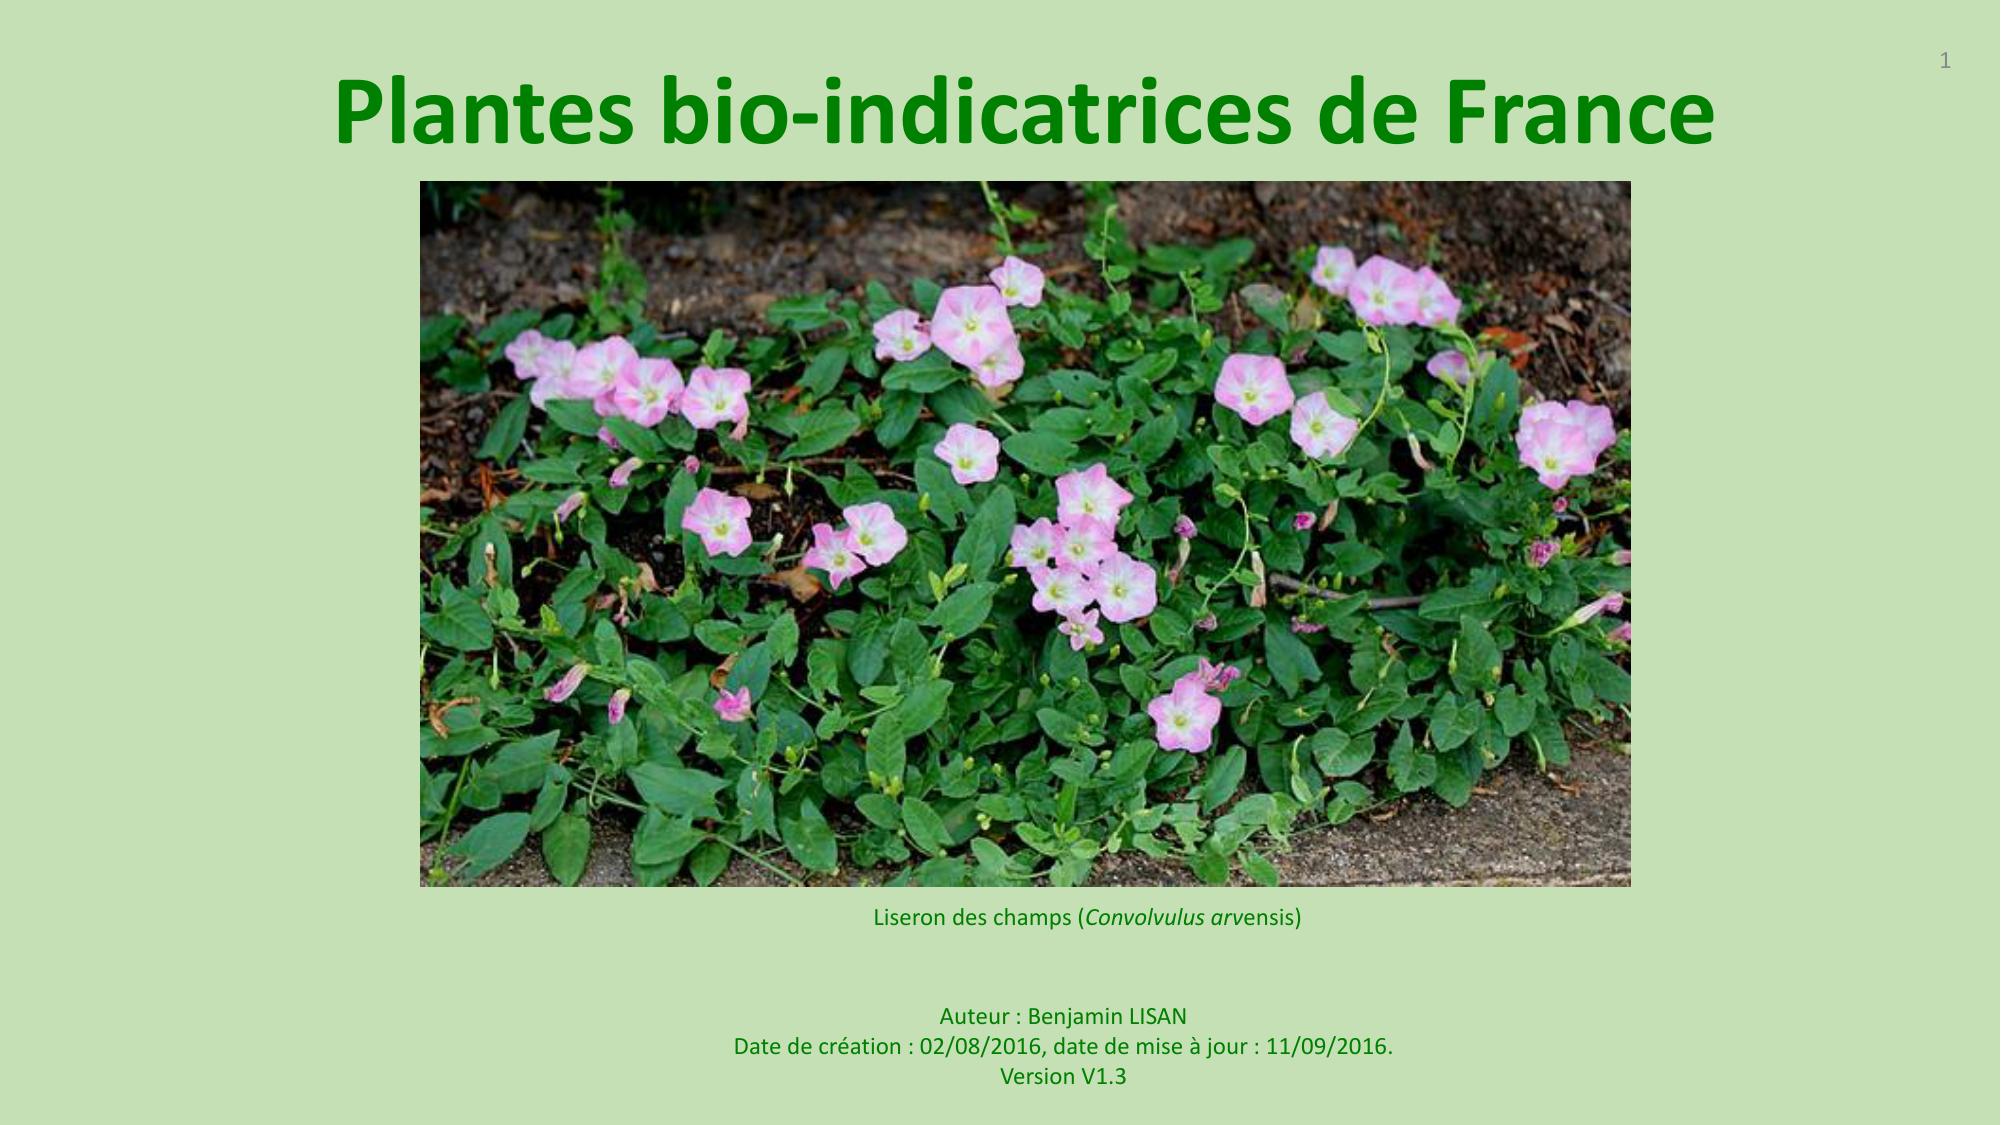 plantes bio-indicatrices de france